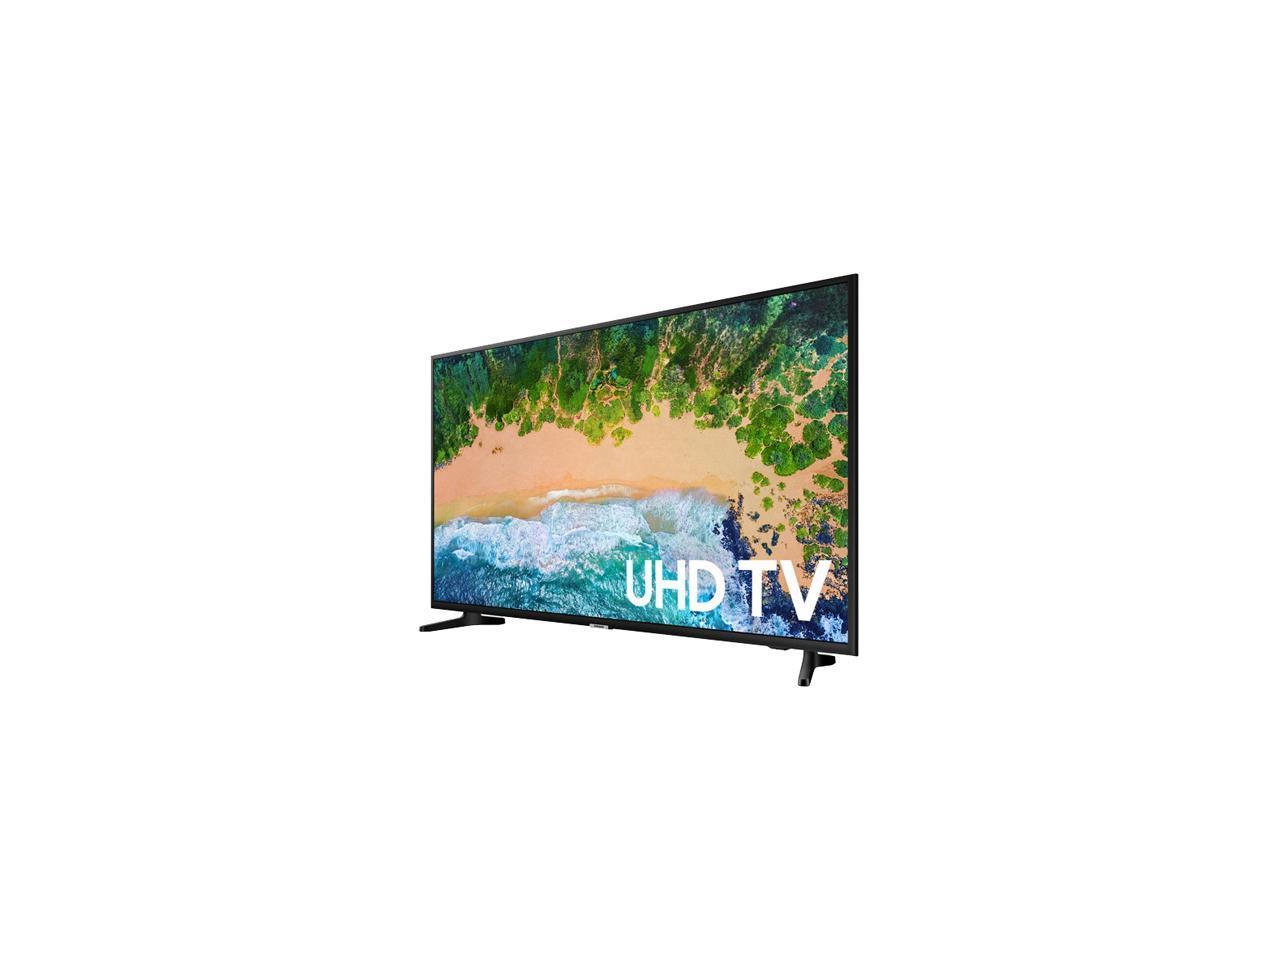 "Samsung NU6900 43"" 4K Motion Rate 120 LED TV UN43NU6900FXZA (2018) + Samsung 128GB FIT PLUS Flash Drive for $297 + FS"